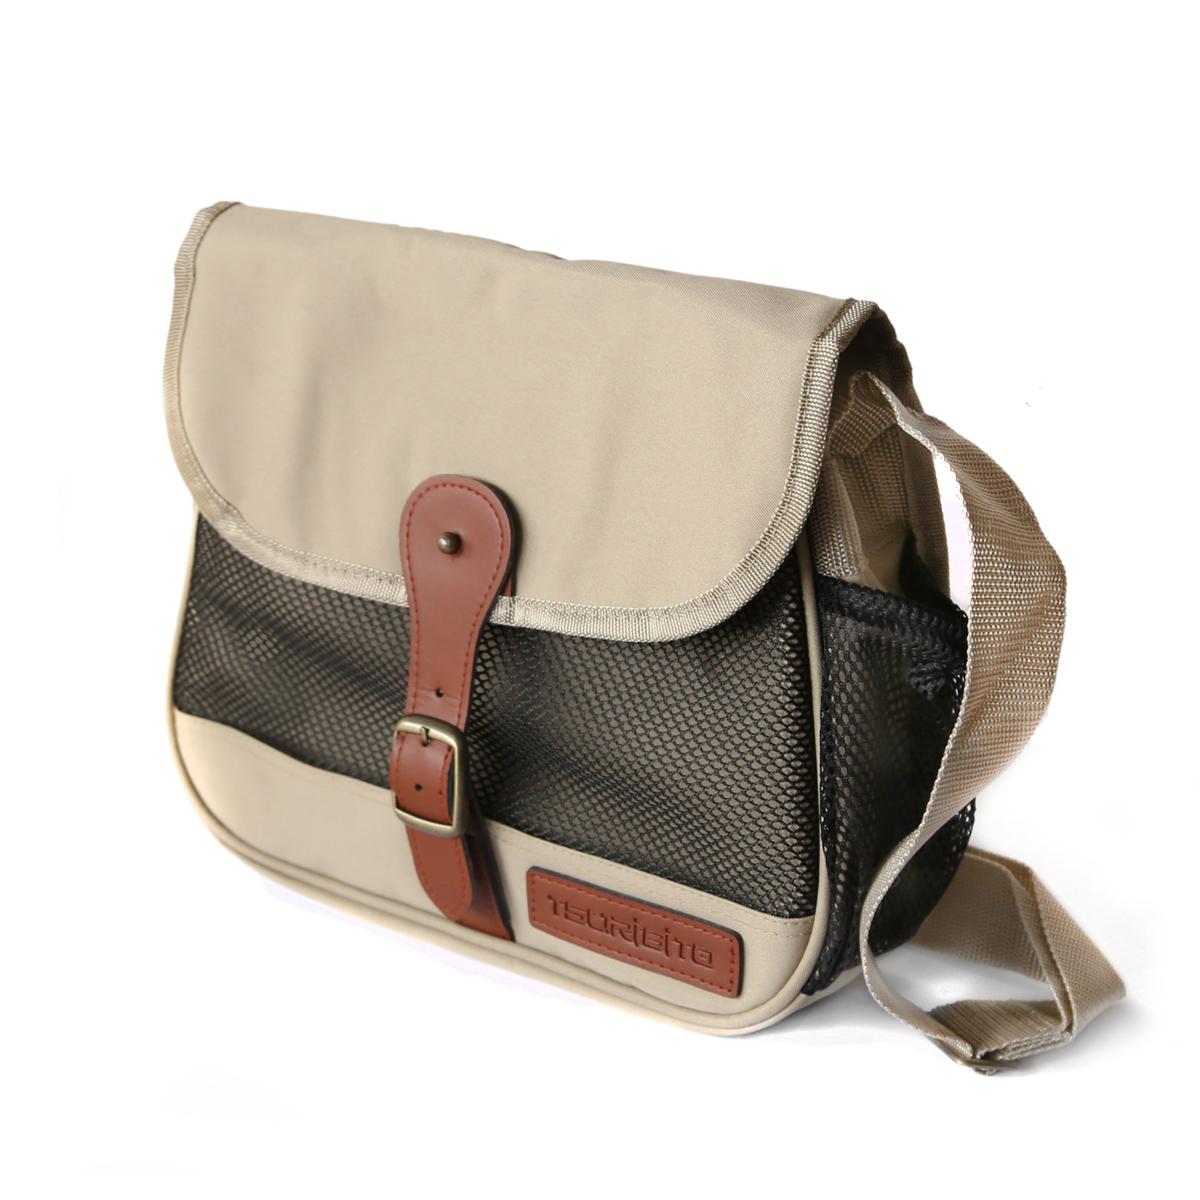 Сумка Tsuribito Shoulder Bag, для хранения коробок с приманками. Размер M сумка для хранения bag in bag